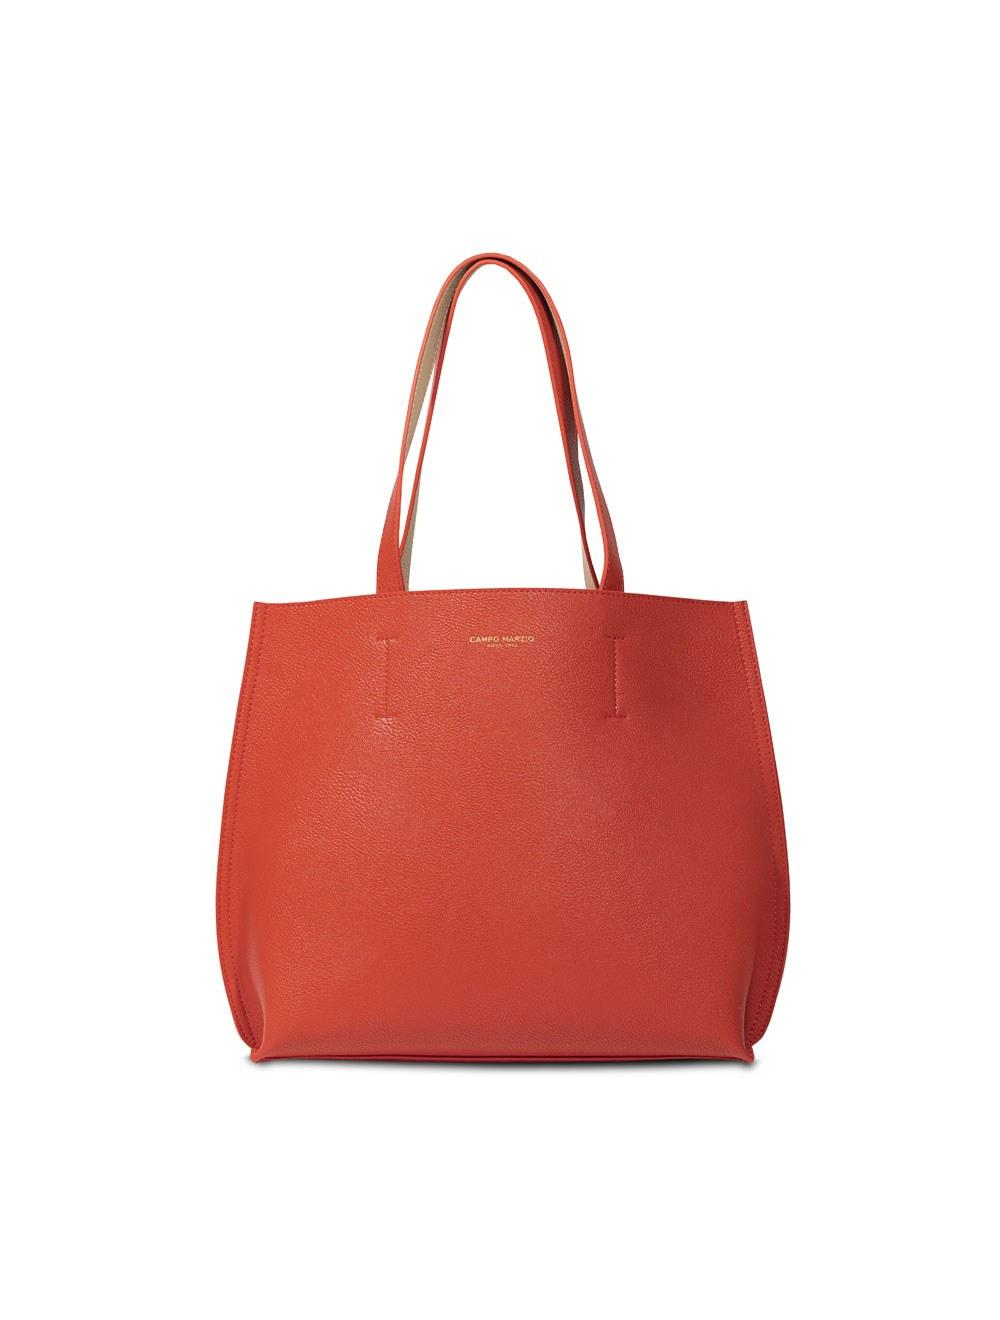 Double Tote Bag Midi - Tangerine Tango